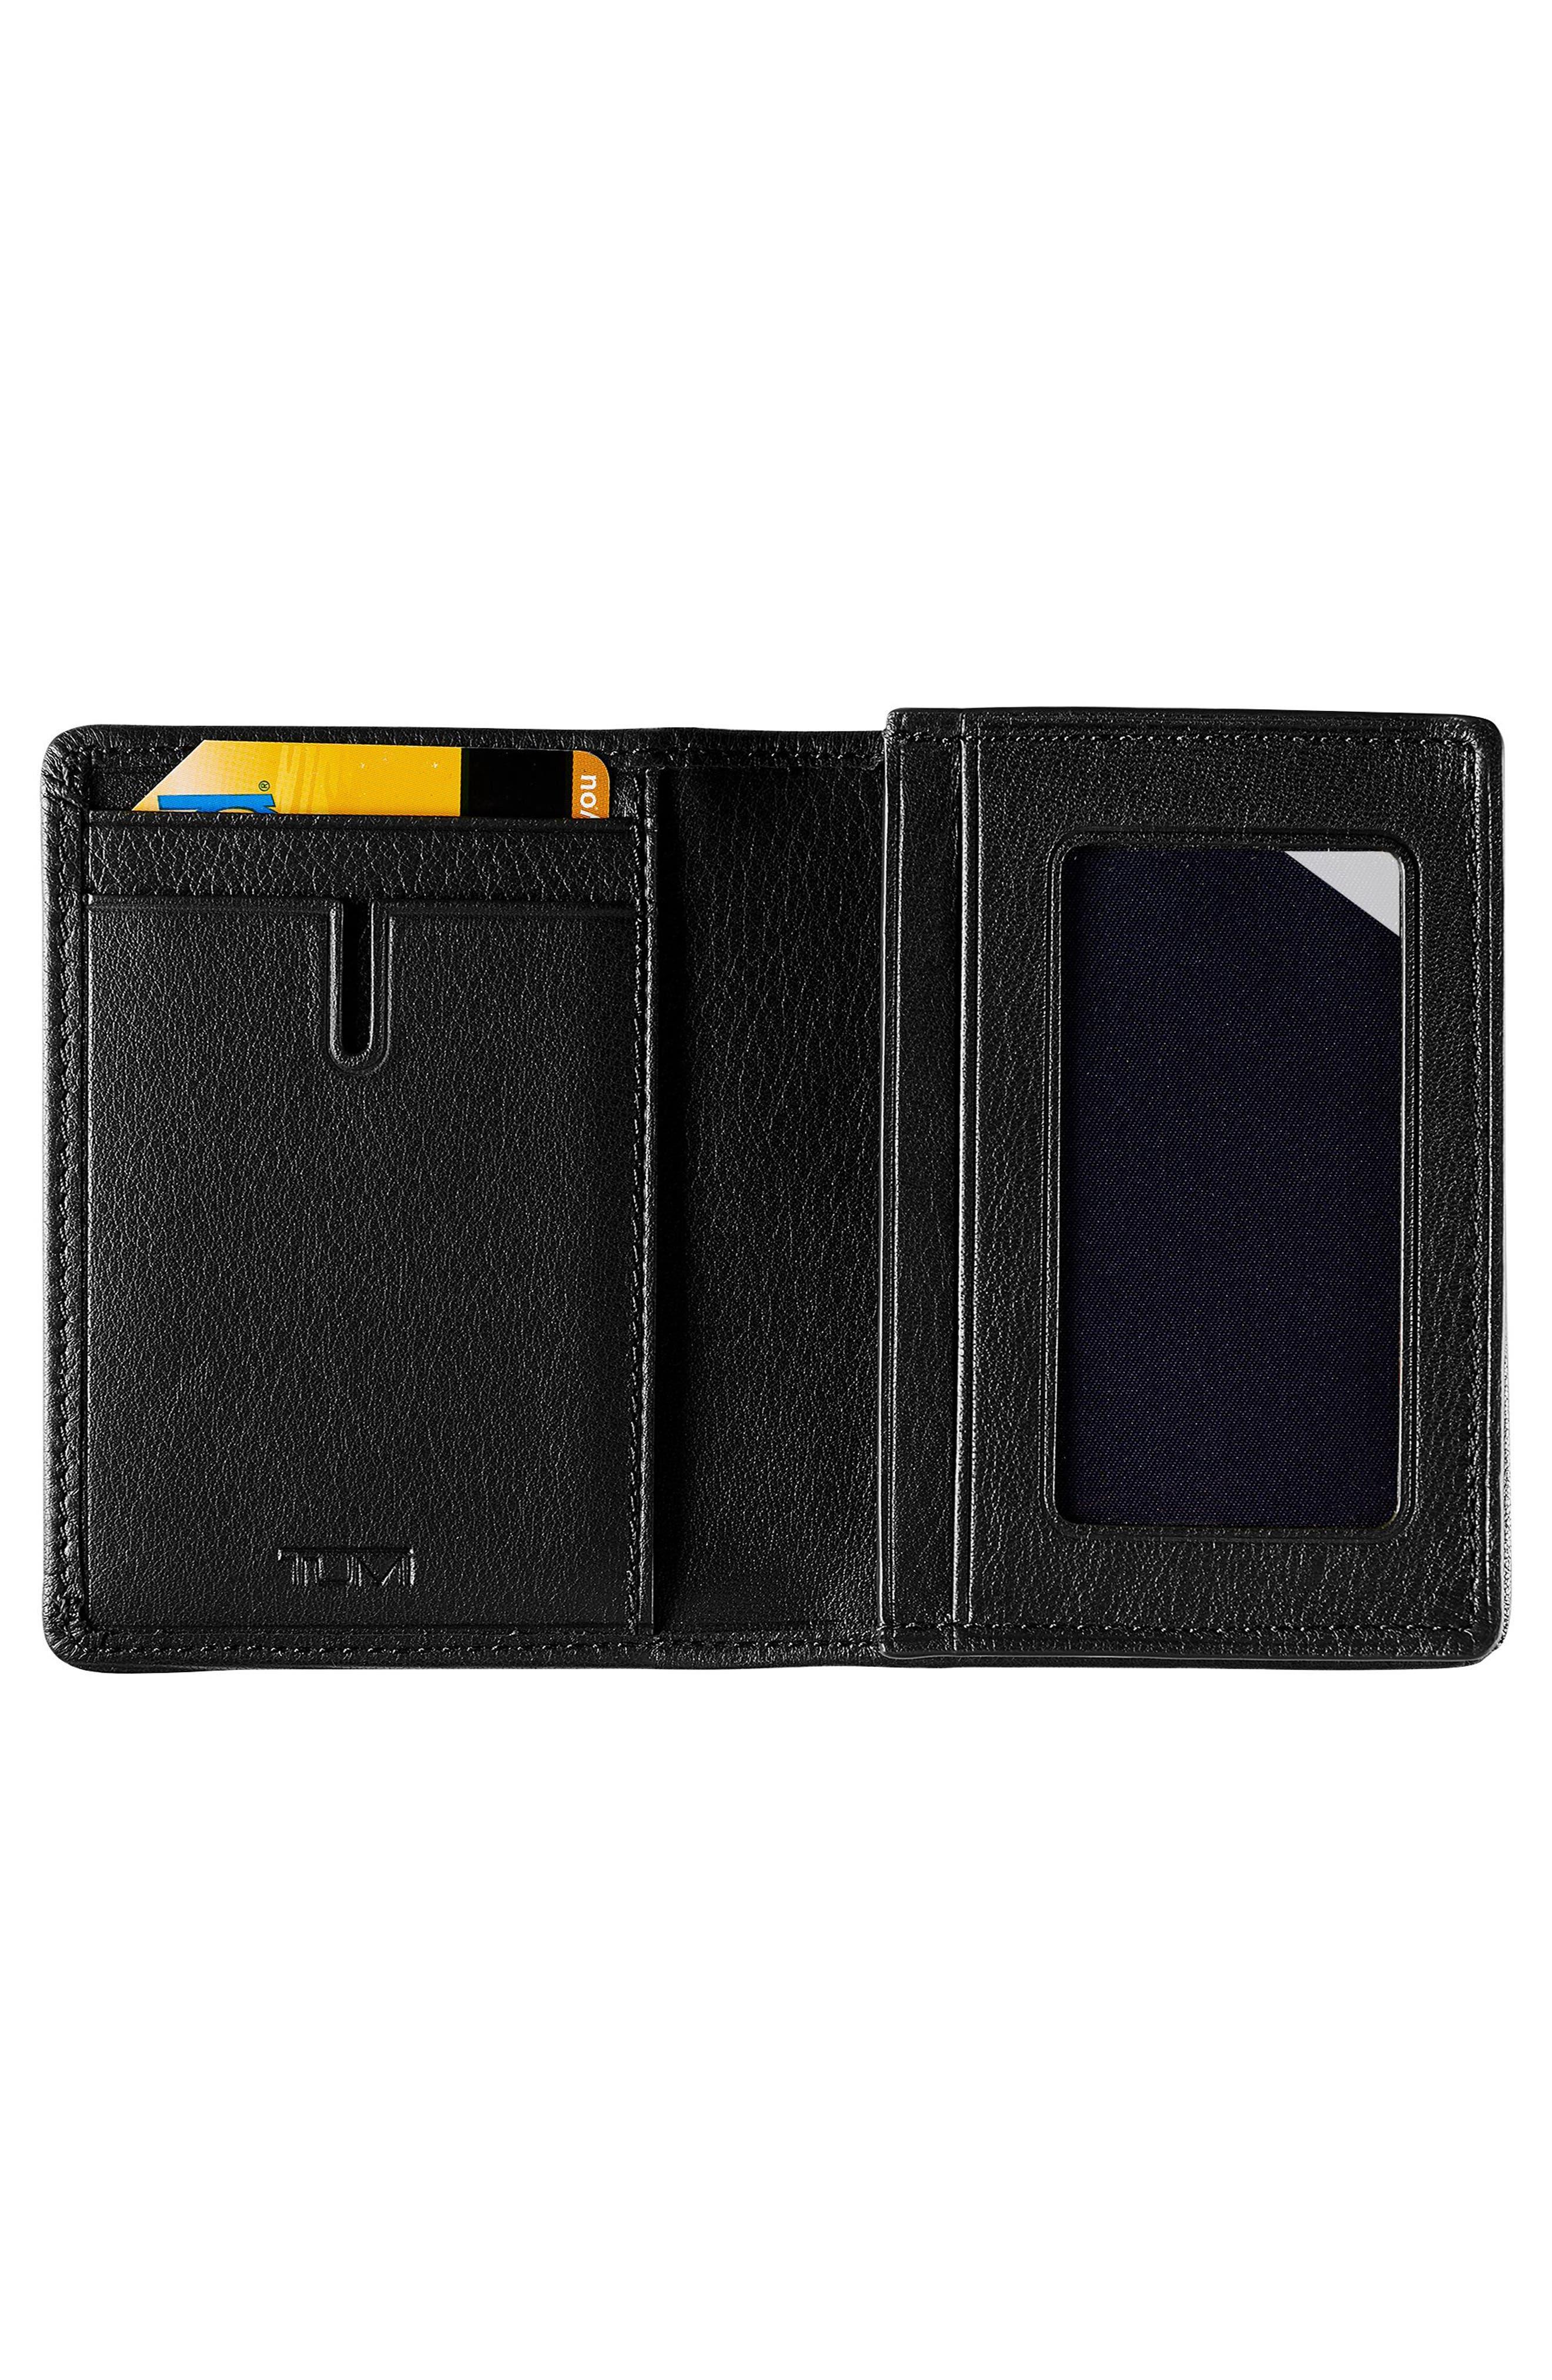 TUMI,                             Leather RFID Card Case,                             Alternate thumbnail 2, color,                             BLACK TEXTURED